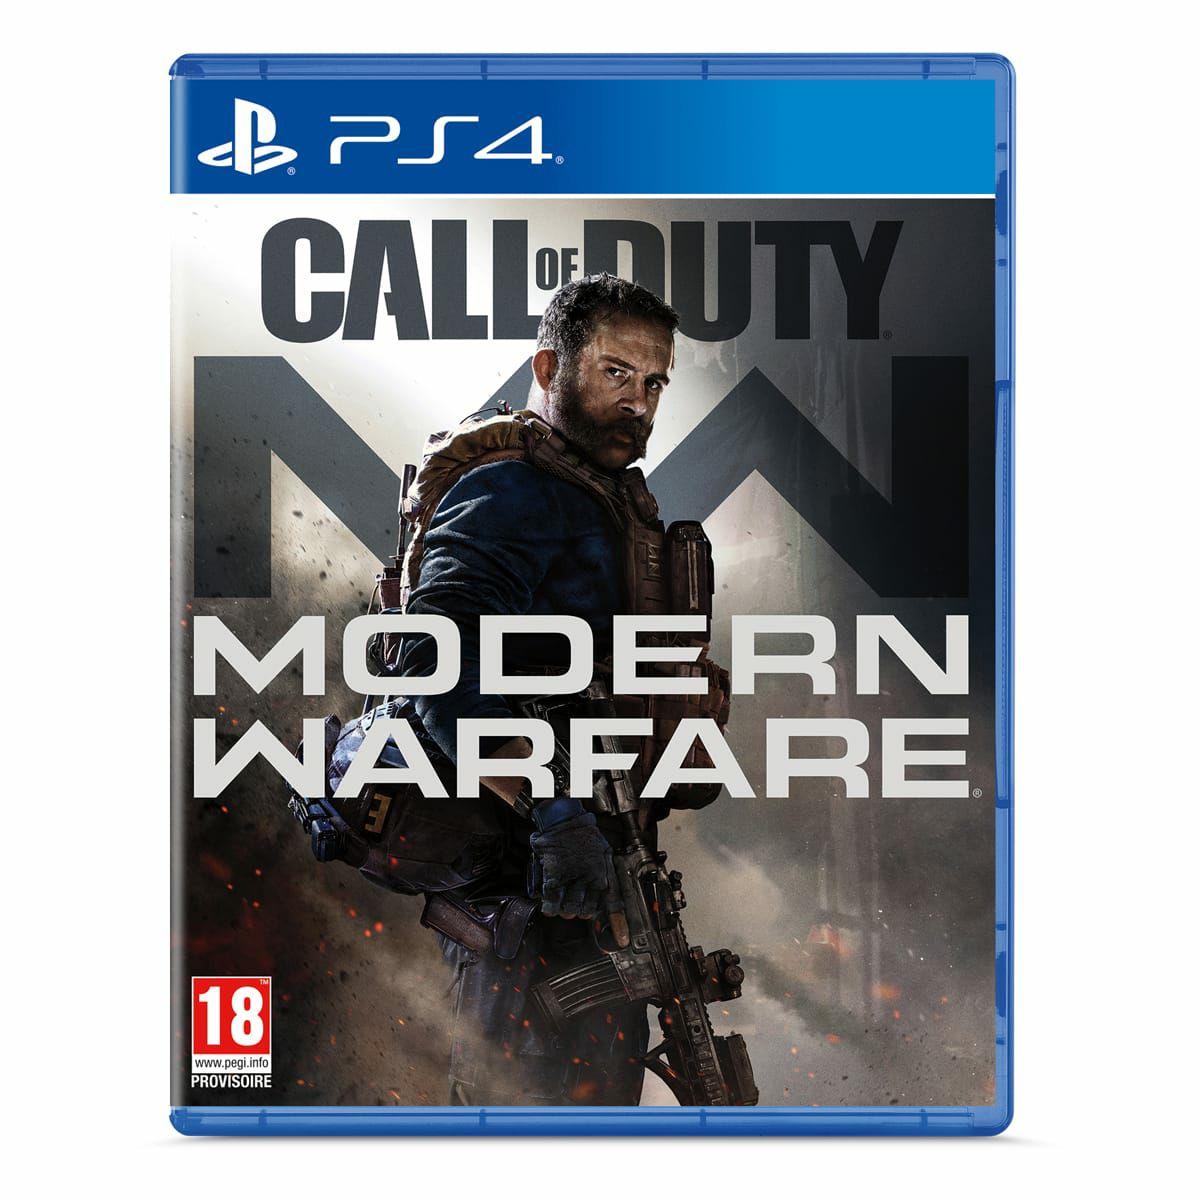 [Précommande] Call Of Duty Modern Warfare sur PS4